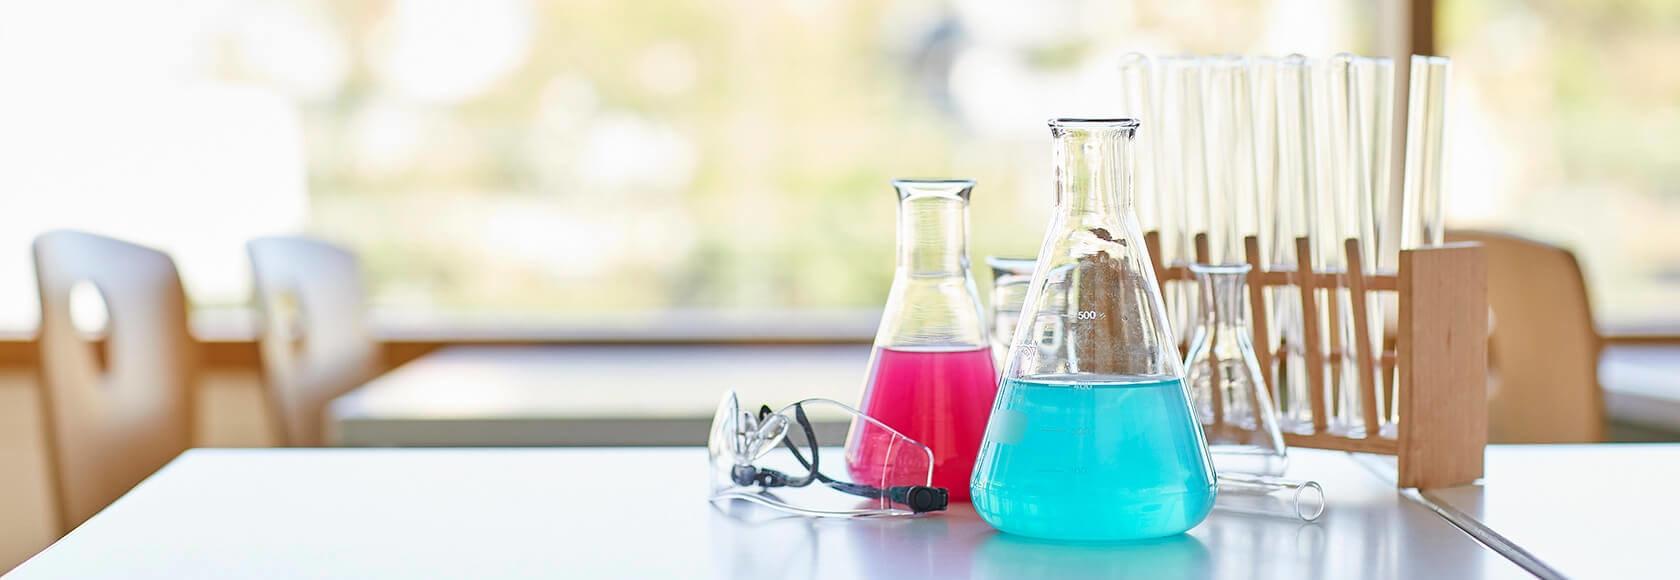 Titelbild Chemie